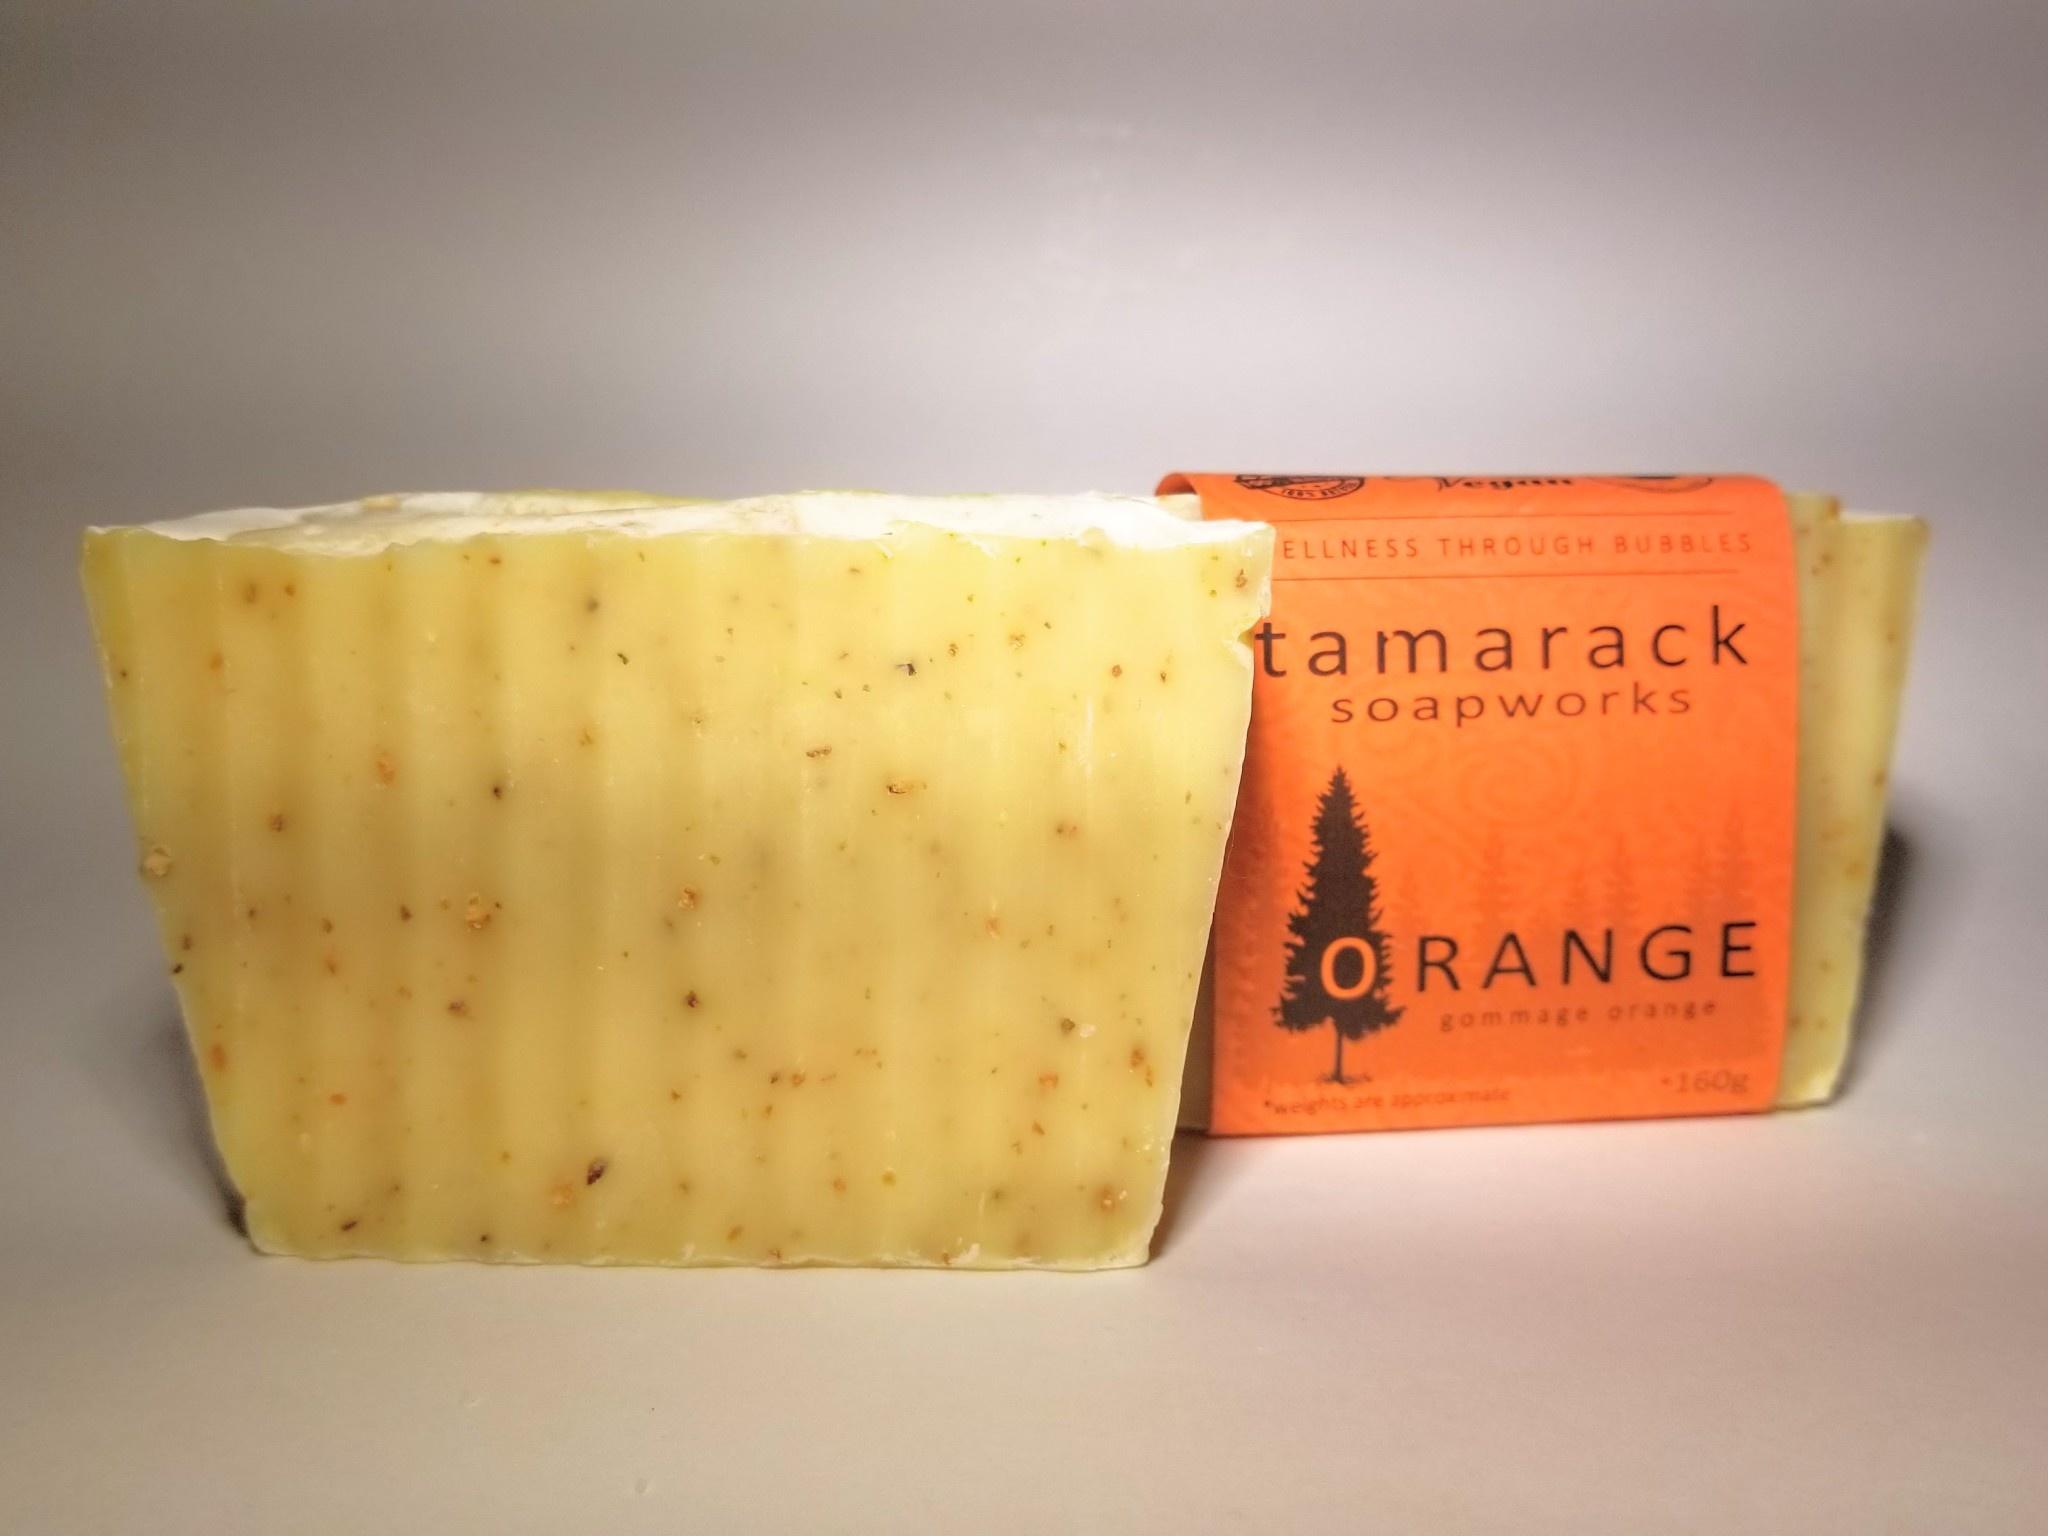 Tamarack Soapworks Tamarack Soapworks Orange Bar Soap